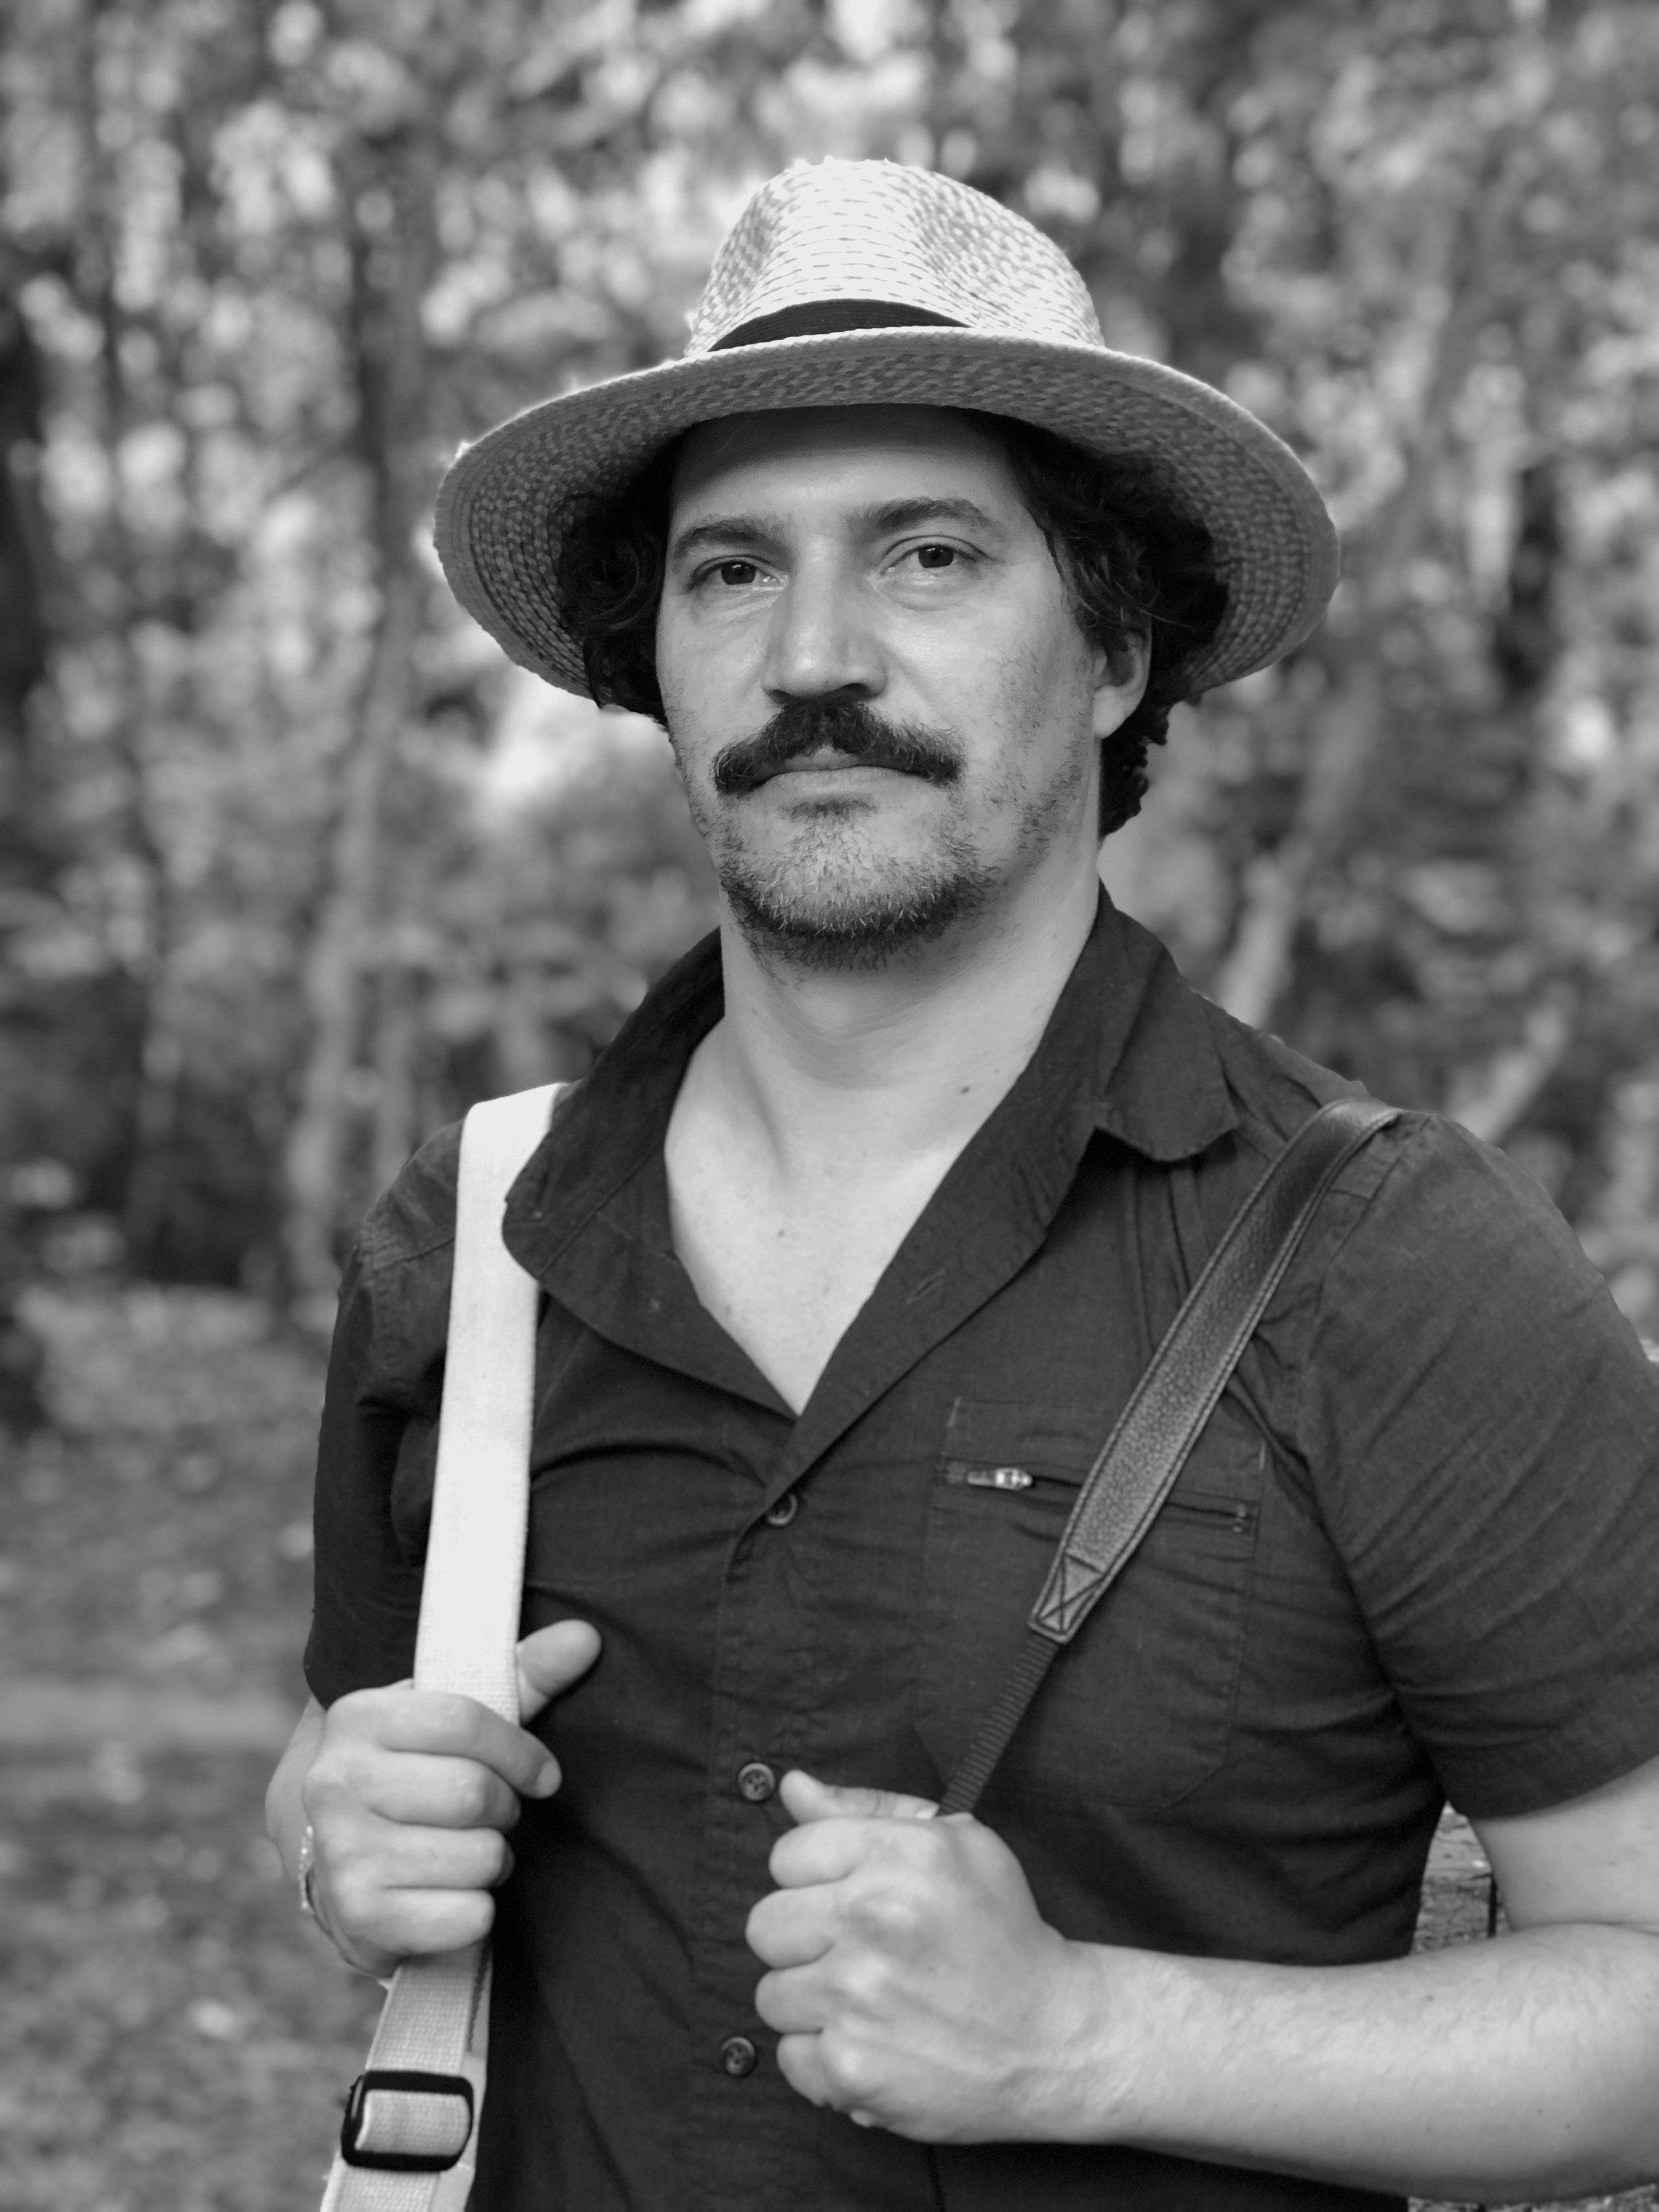 Santiago Escobar-Jaramillo